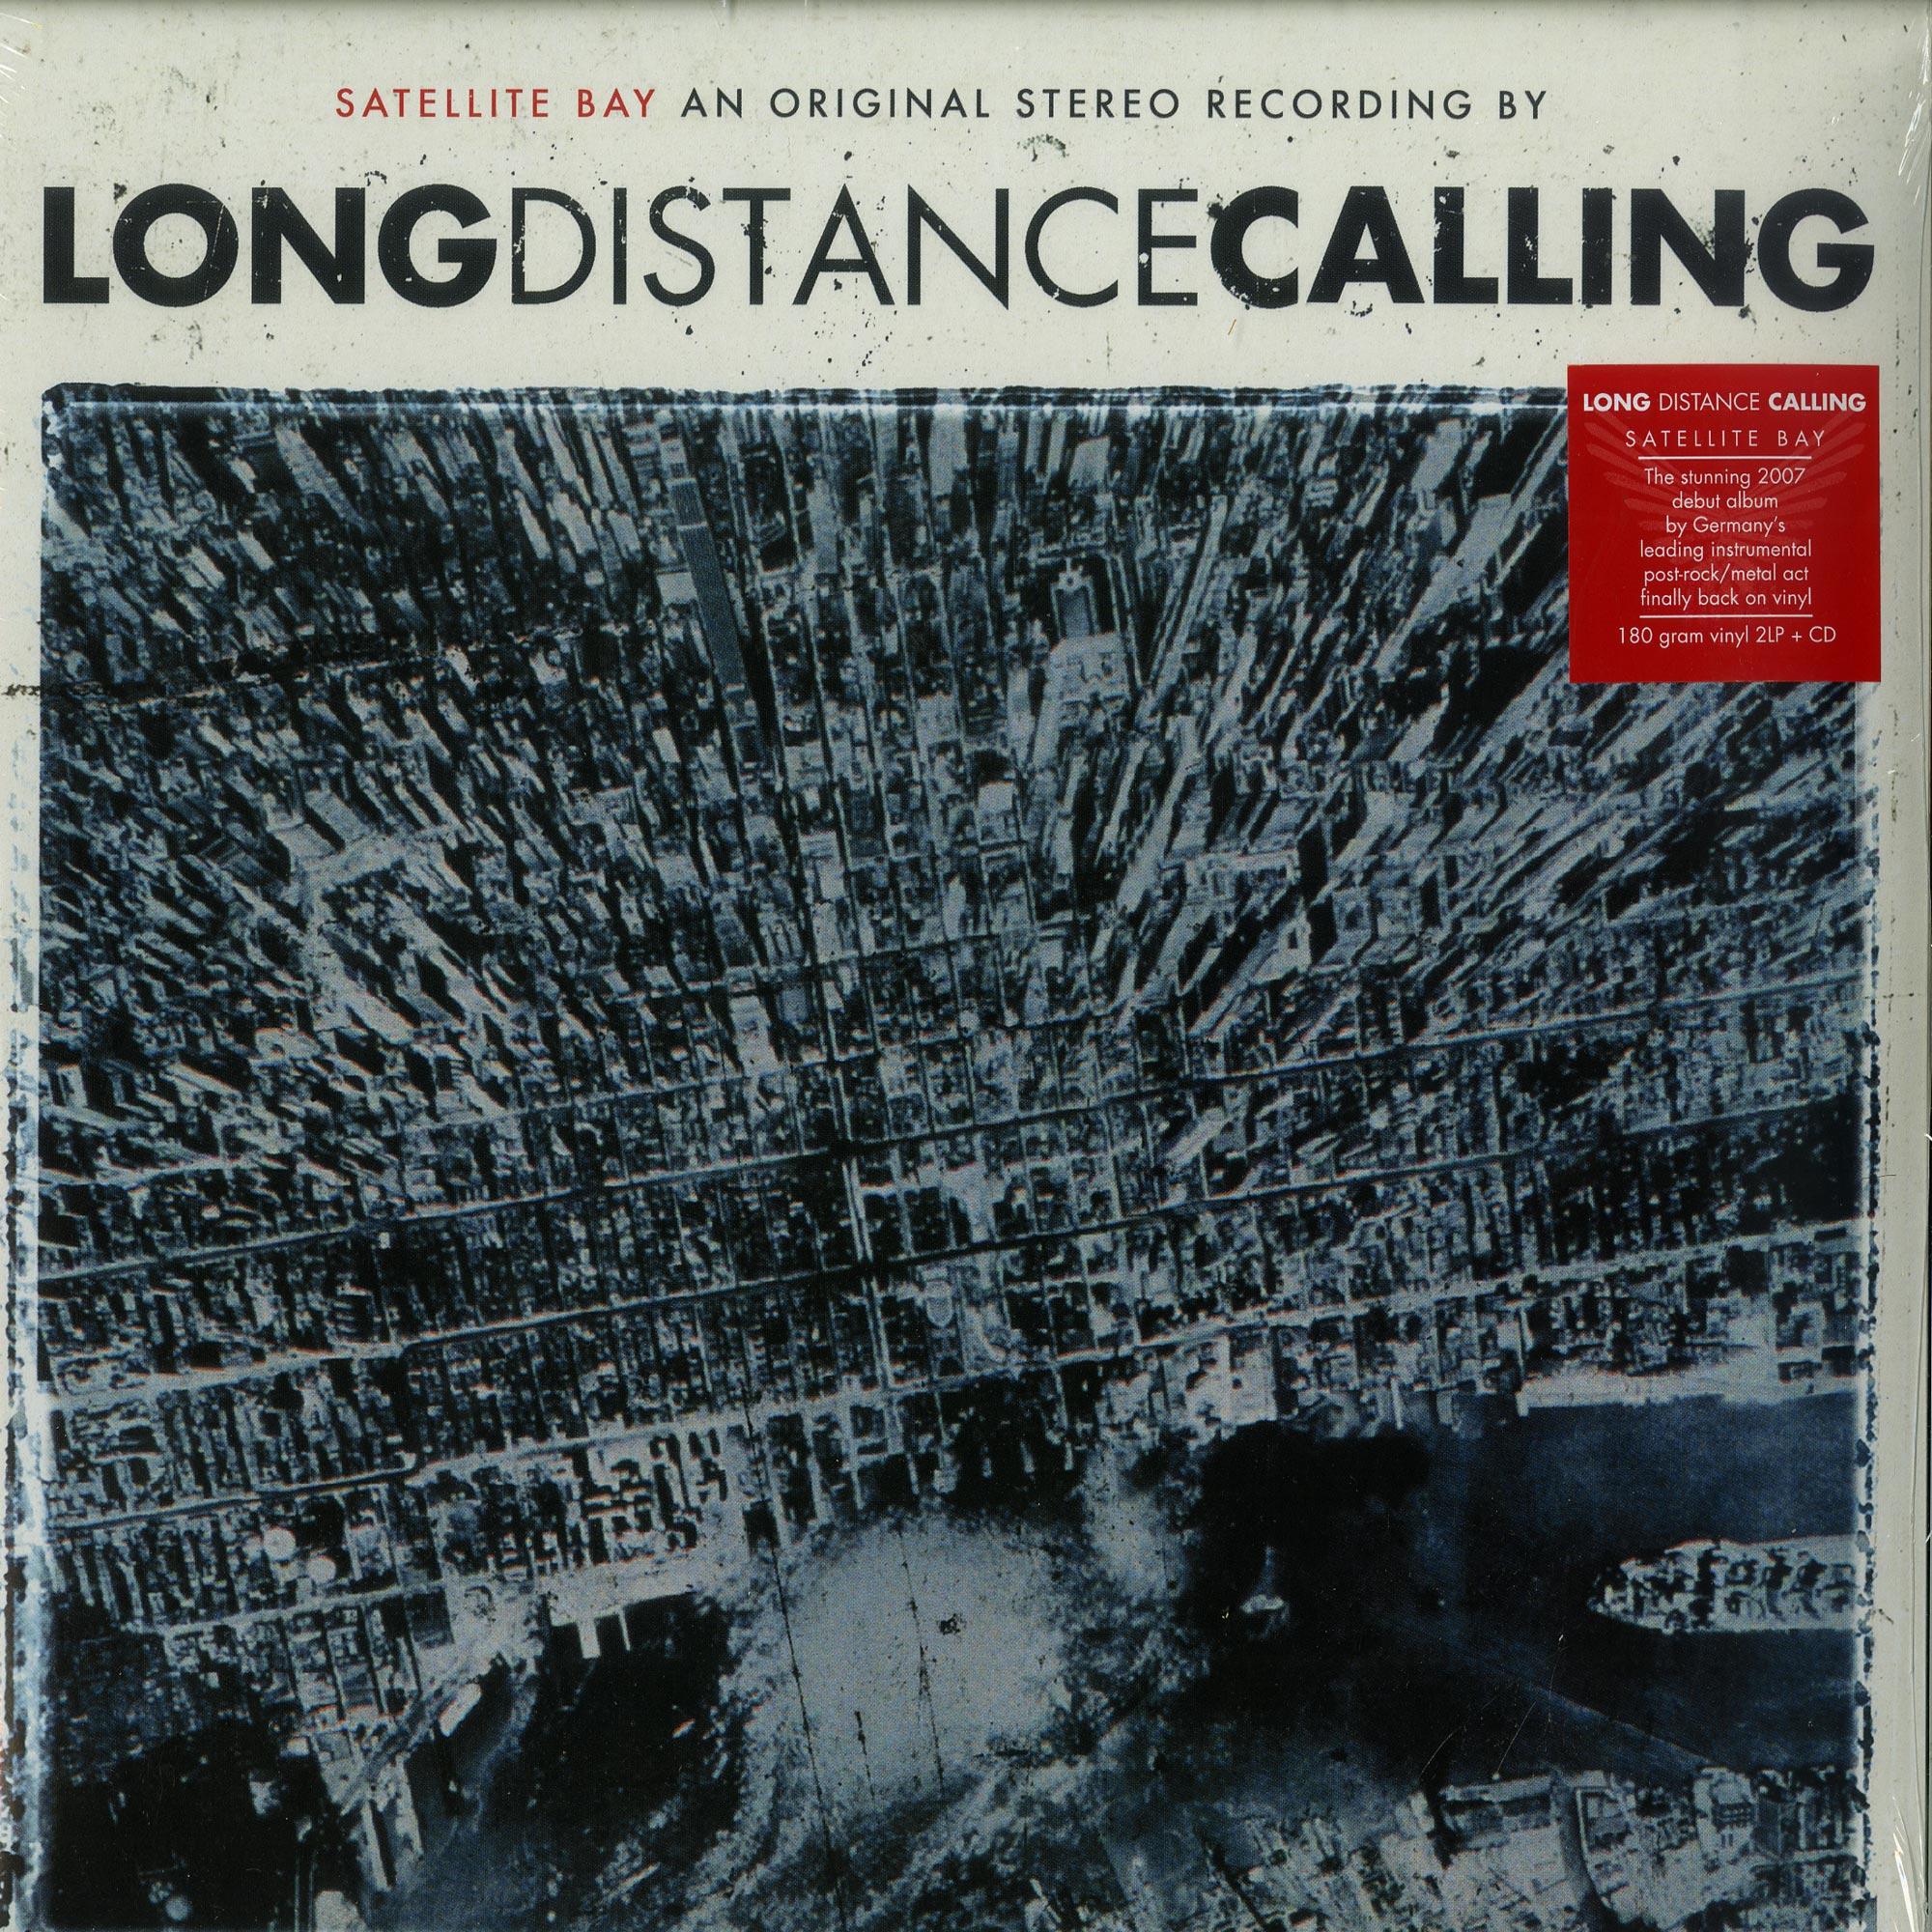 Long Distance Calling - SATELLITE BAY